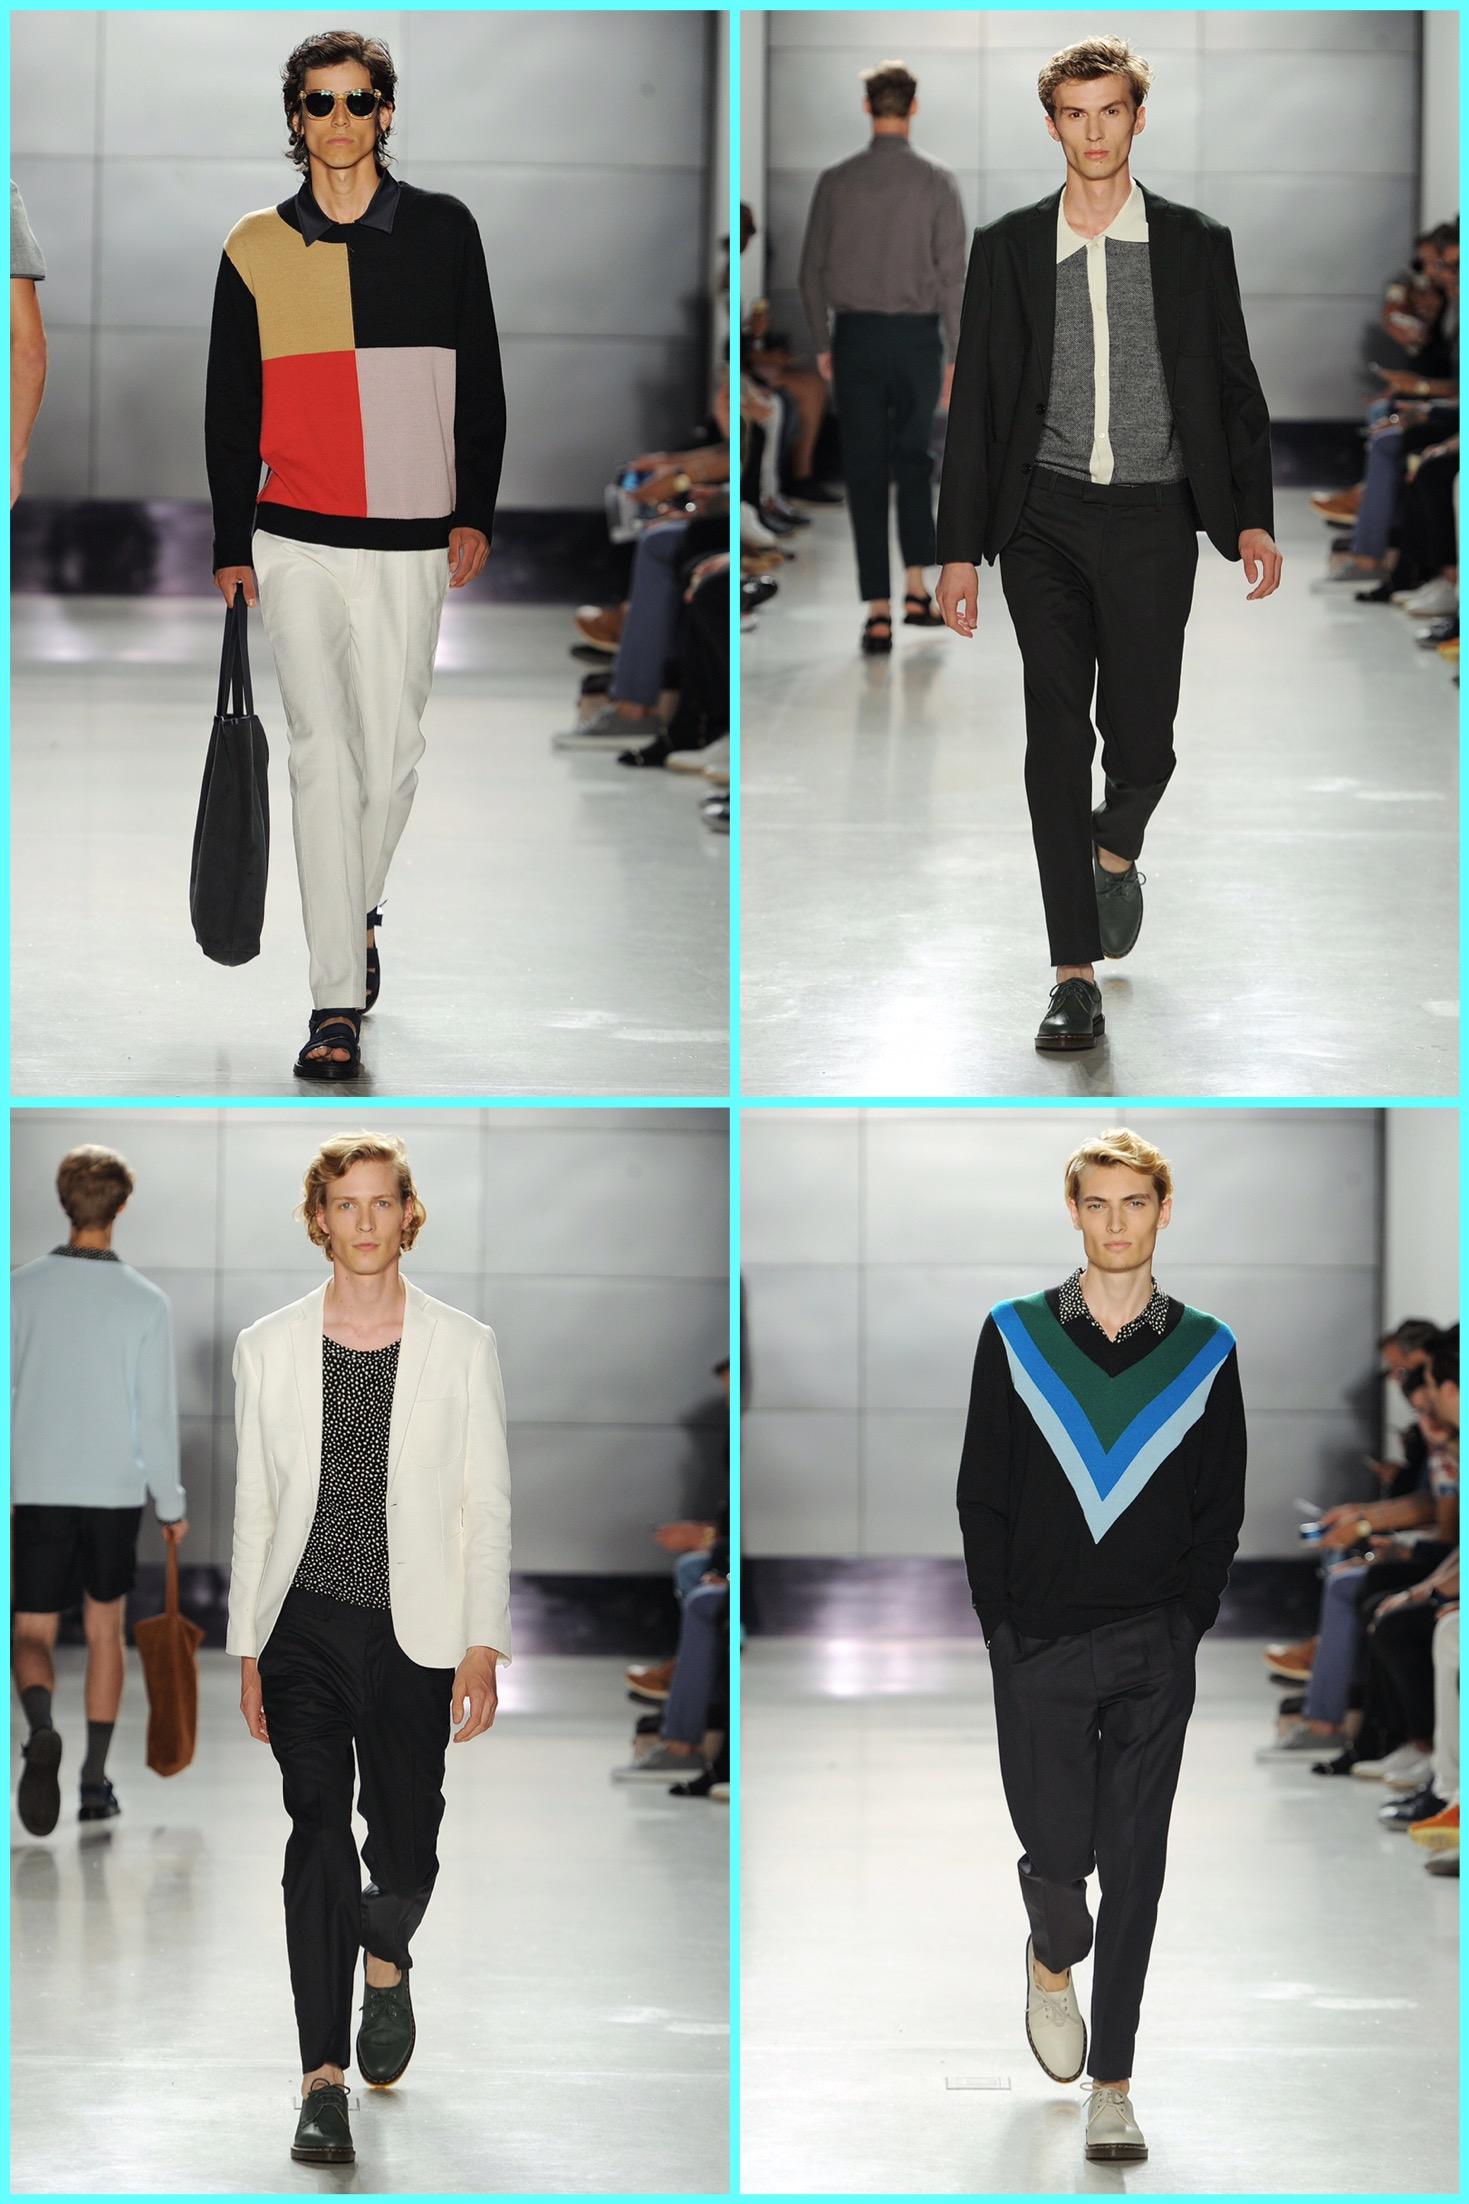 ny-fashion-week-menswear-spring-summer-2017-style-timo-weiland